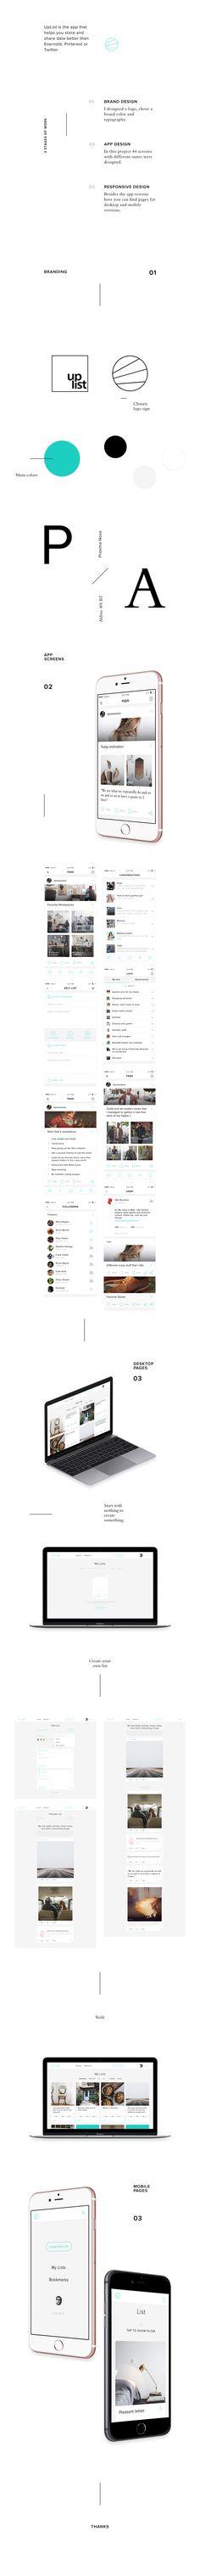 UpList | Logo, iOS App and Website Design on Behance